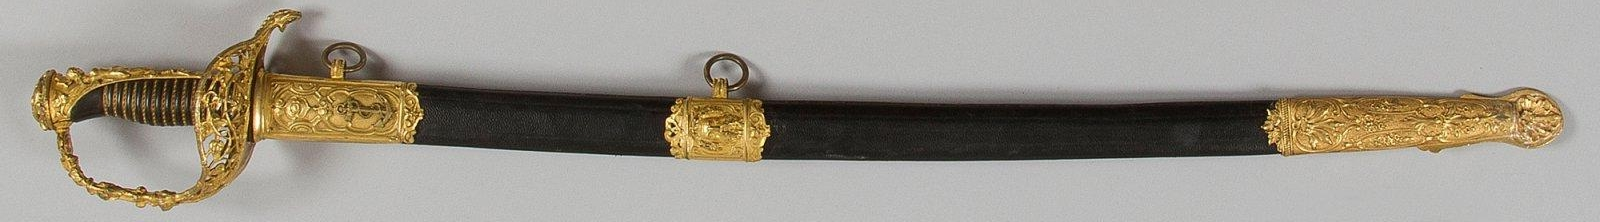 Sabres d'officier de marine : 1837, 1853, 1870, 1891, 1957 - Page 5 1201110